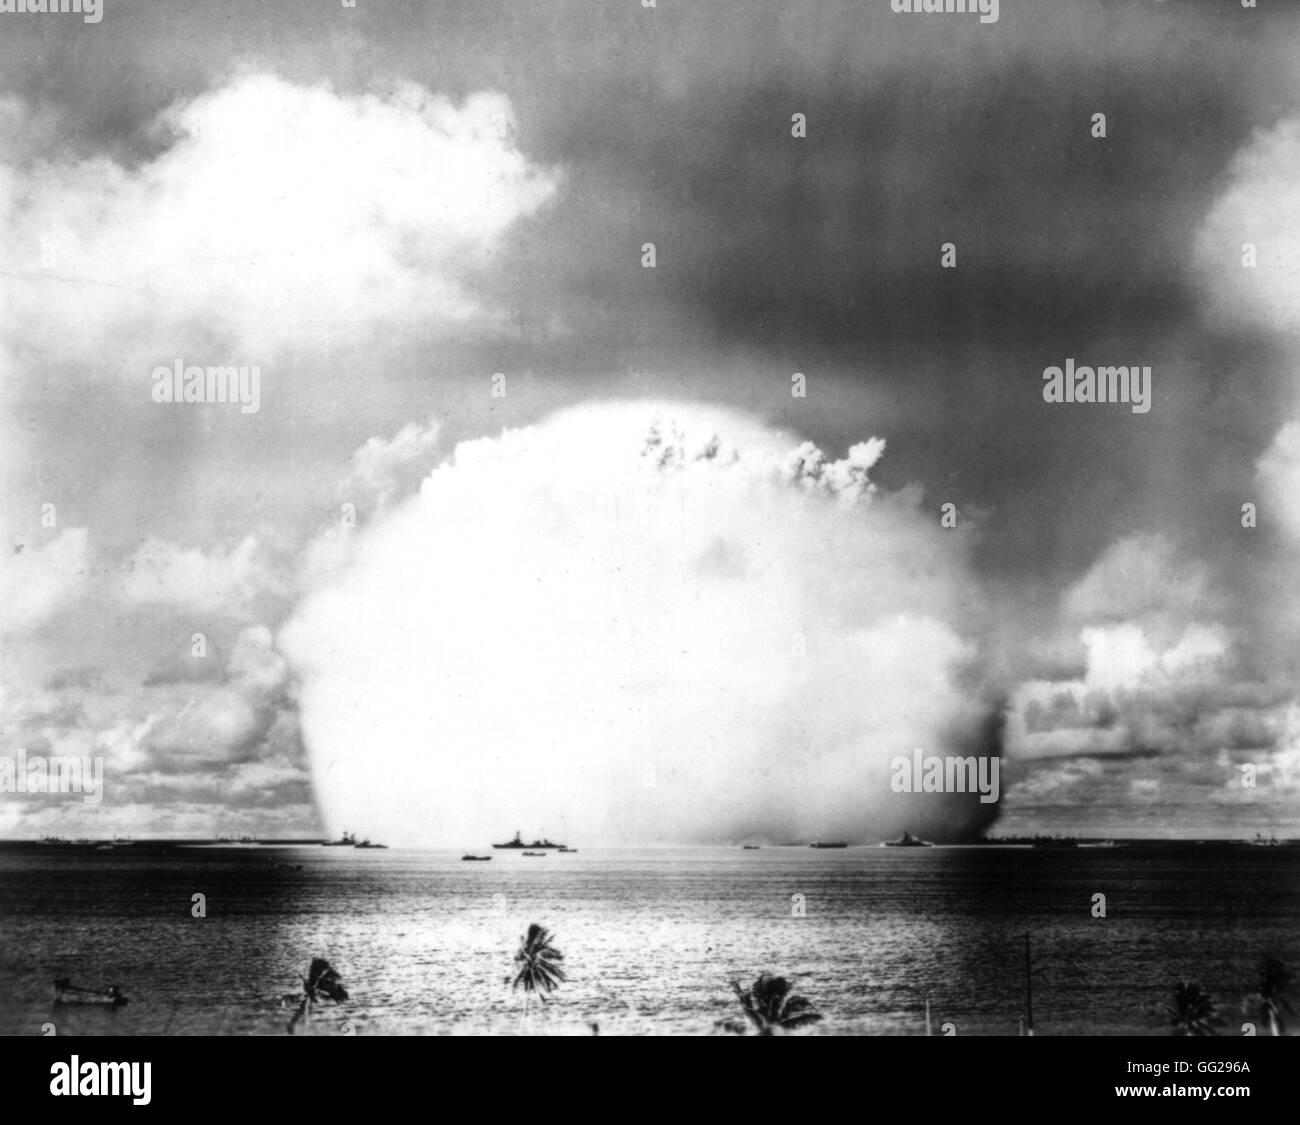 bikini atomexplosion